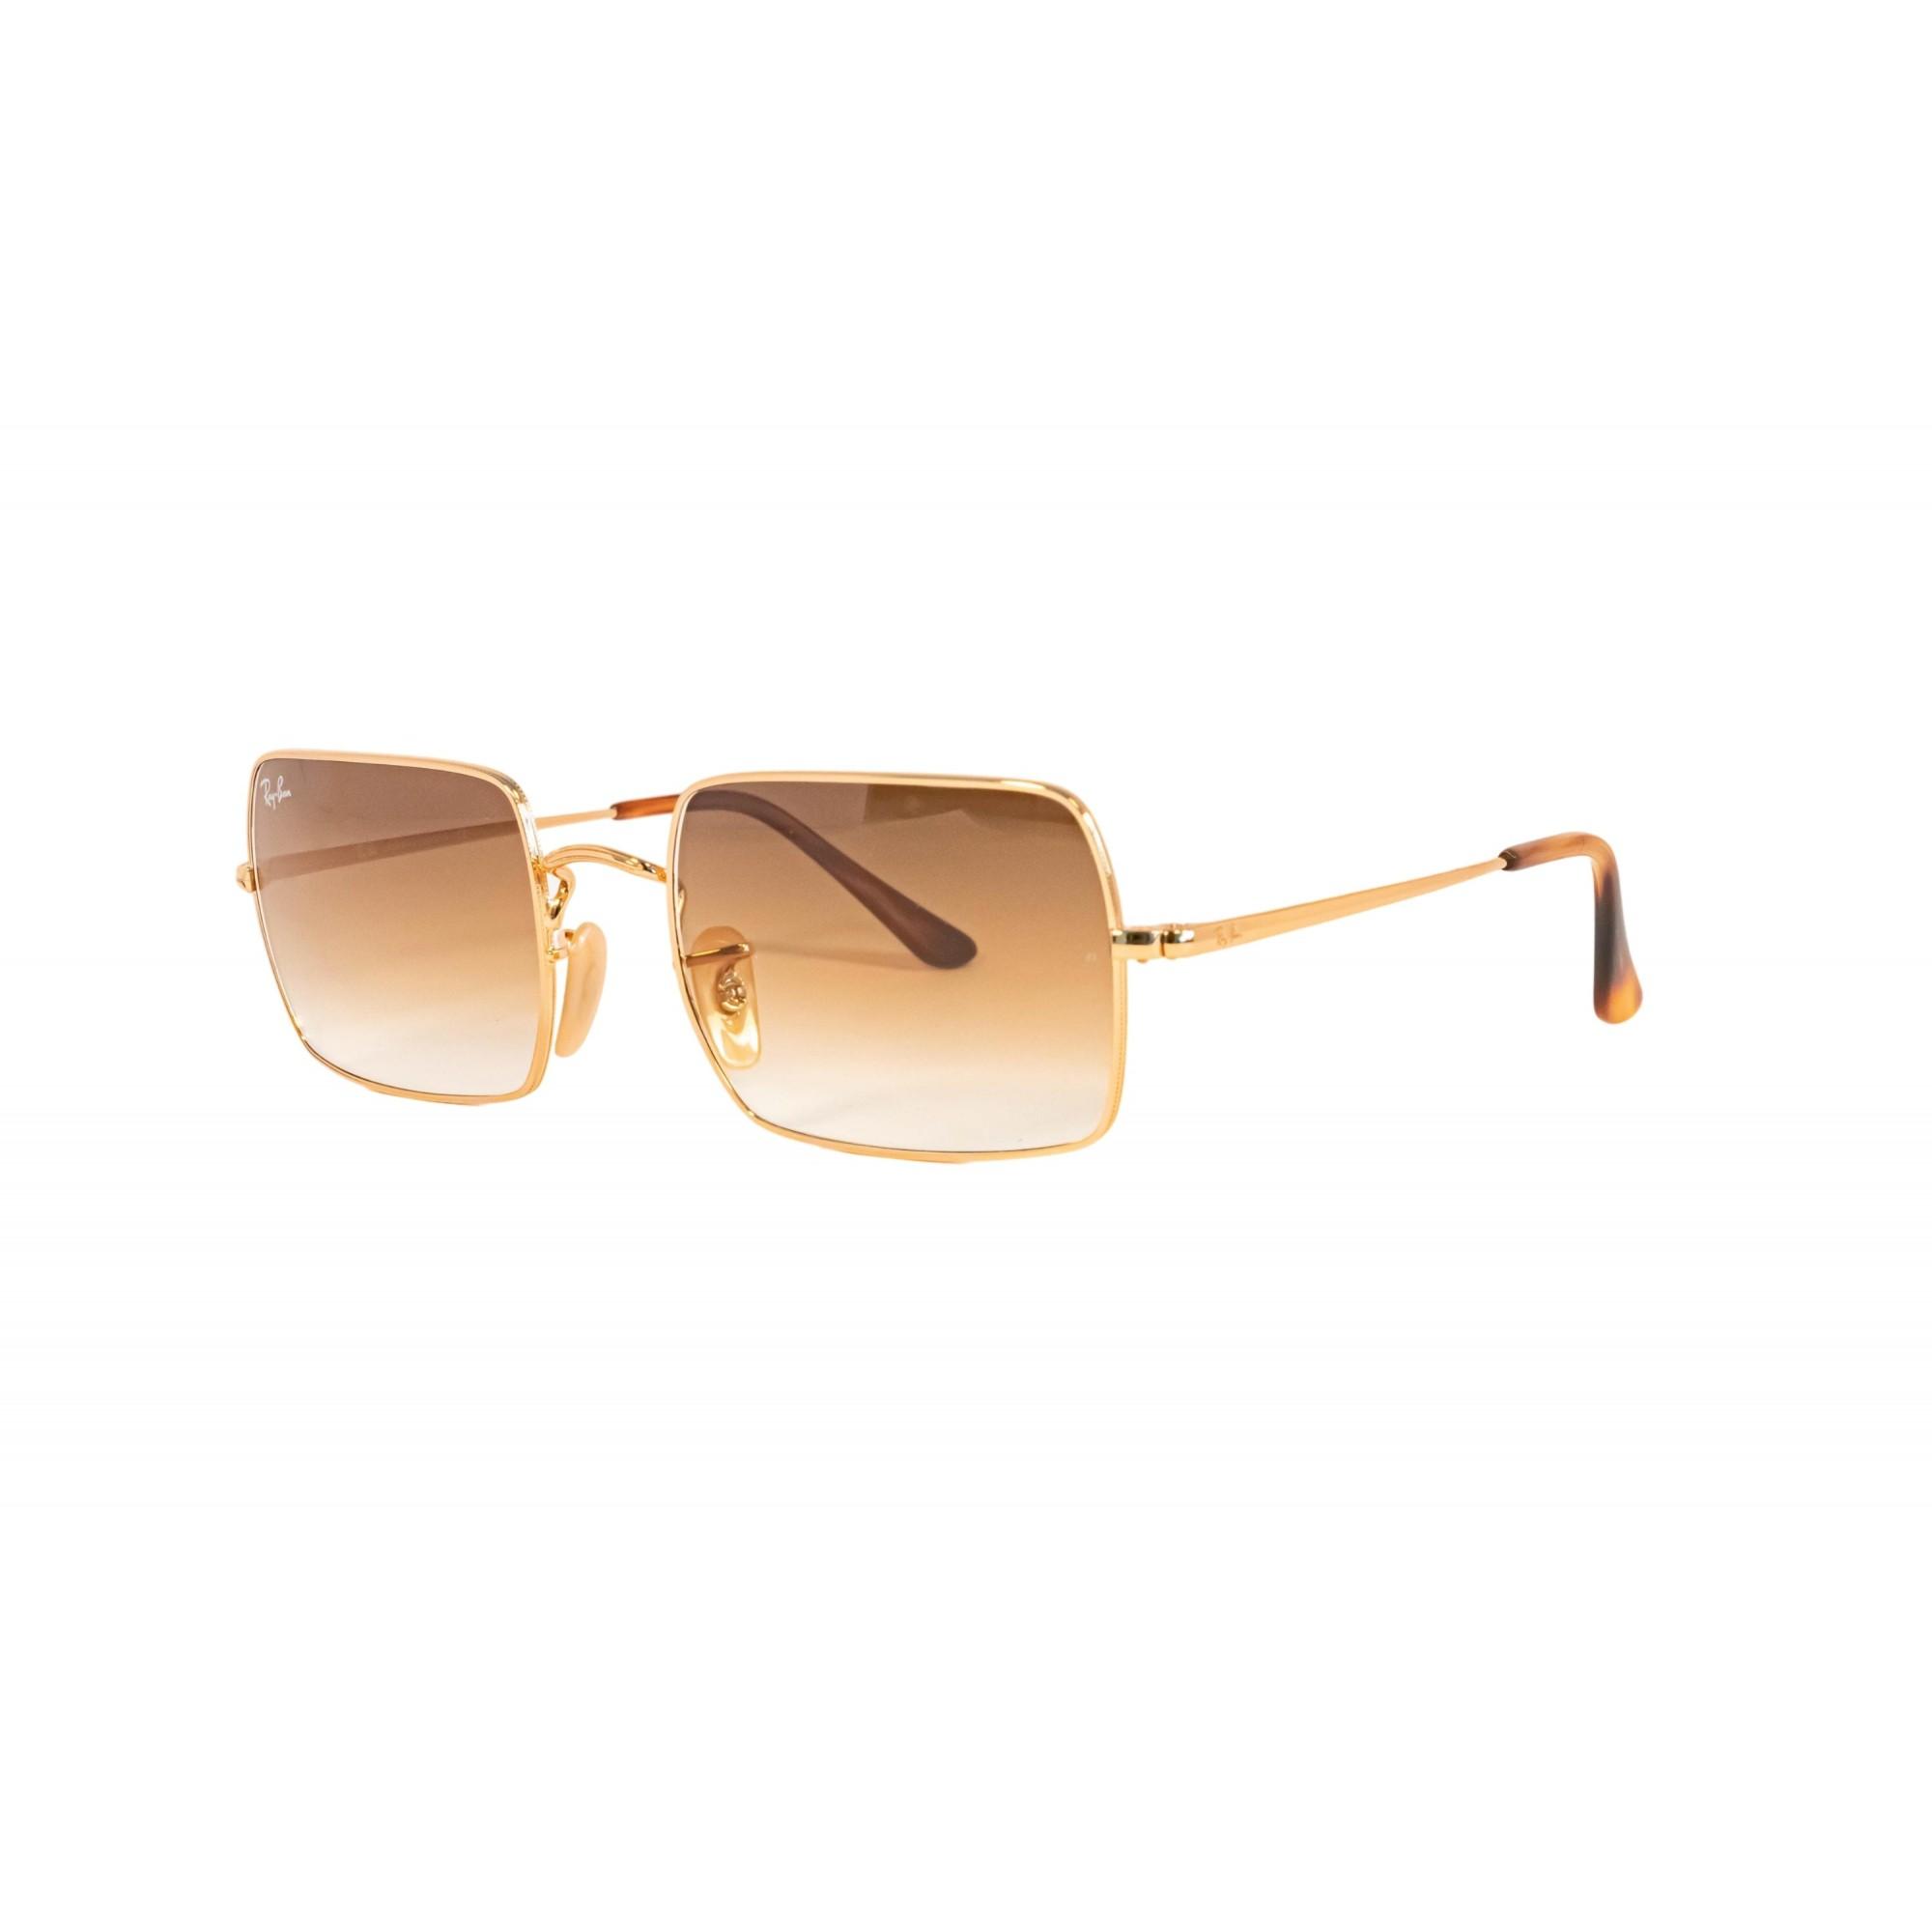 Óculos Ray Ban Square Rb1969 914751 54 Marrom